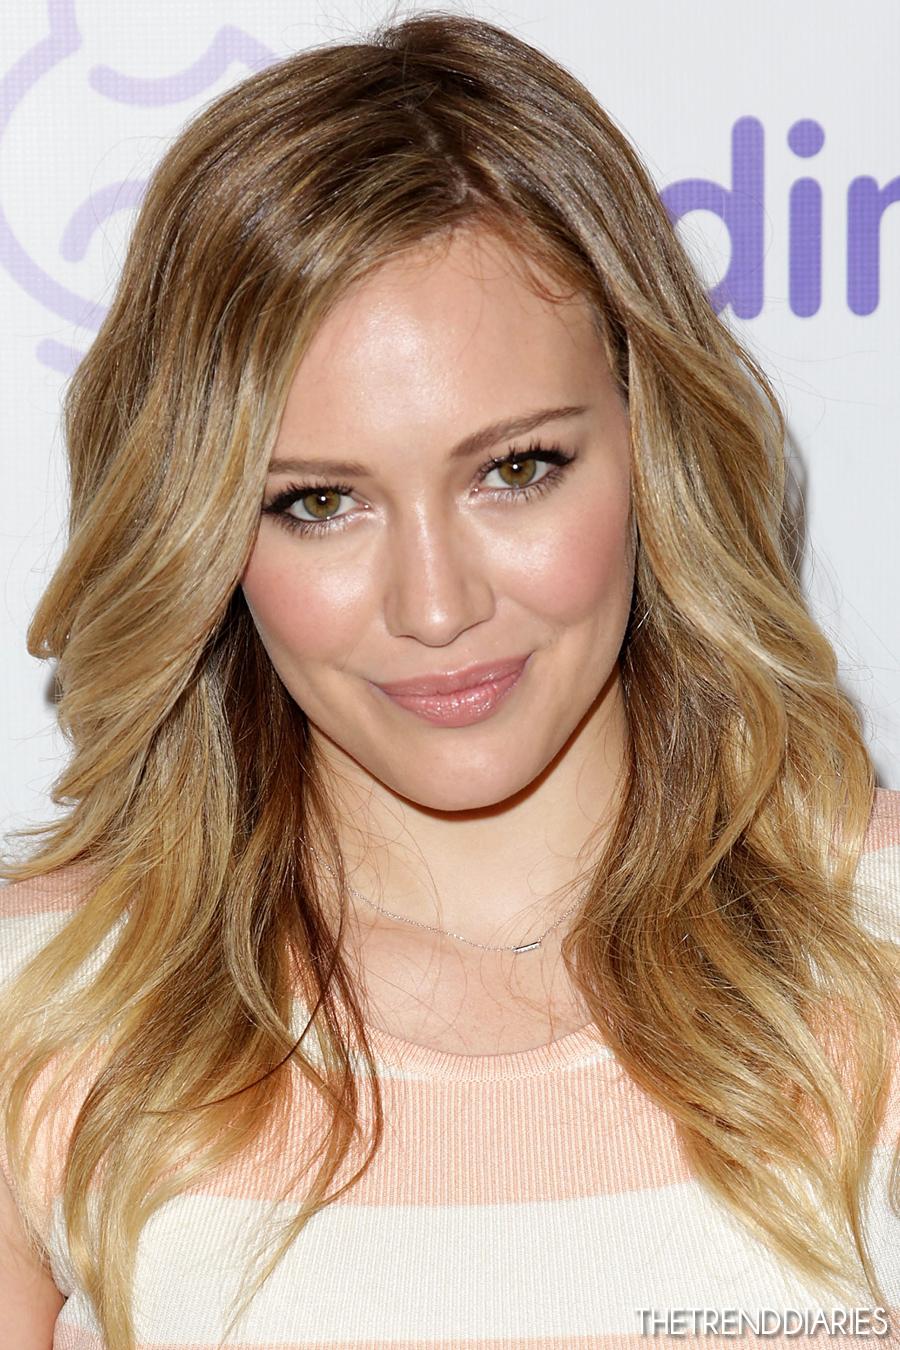 Hilary Duff Hilary Duff Hairstyles